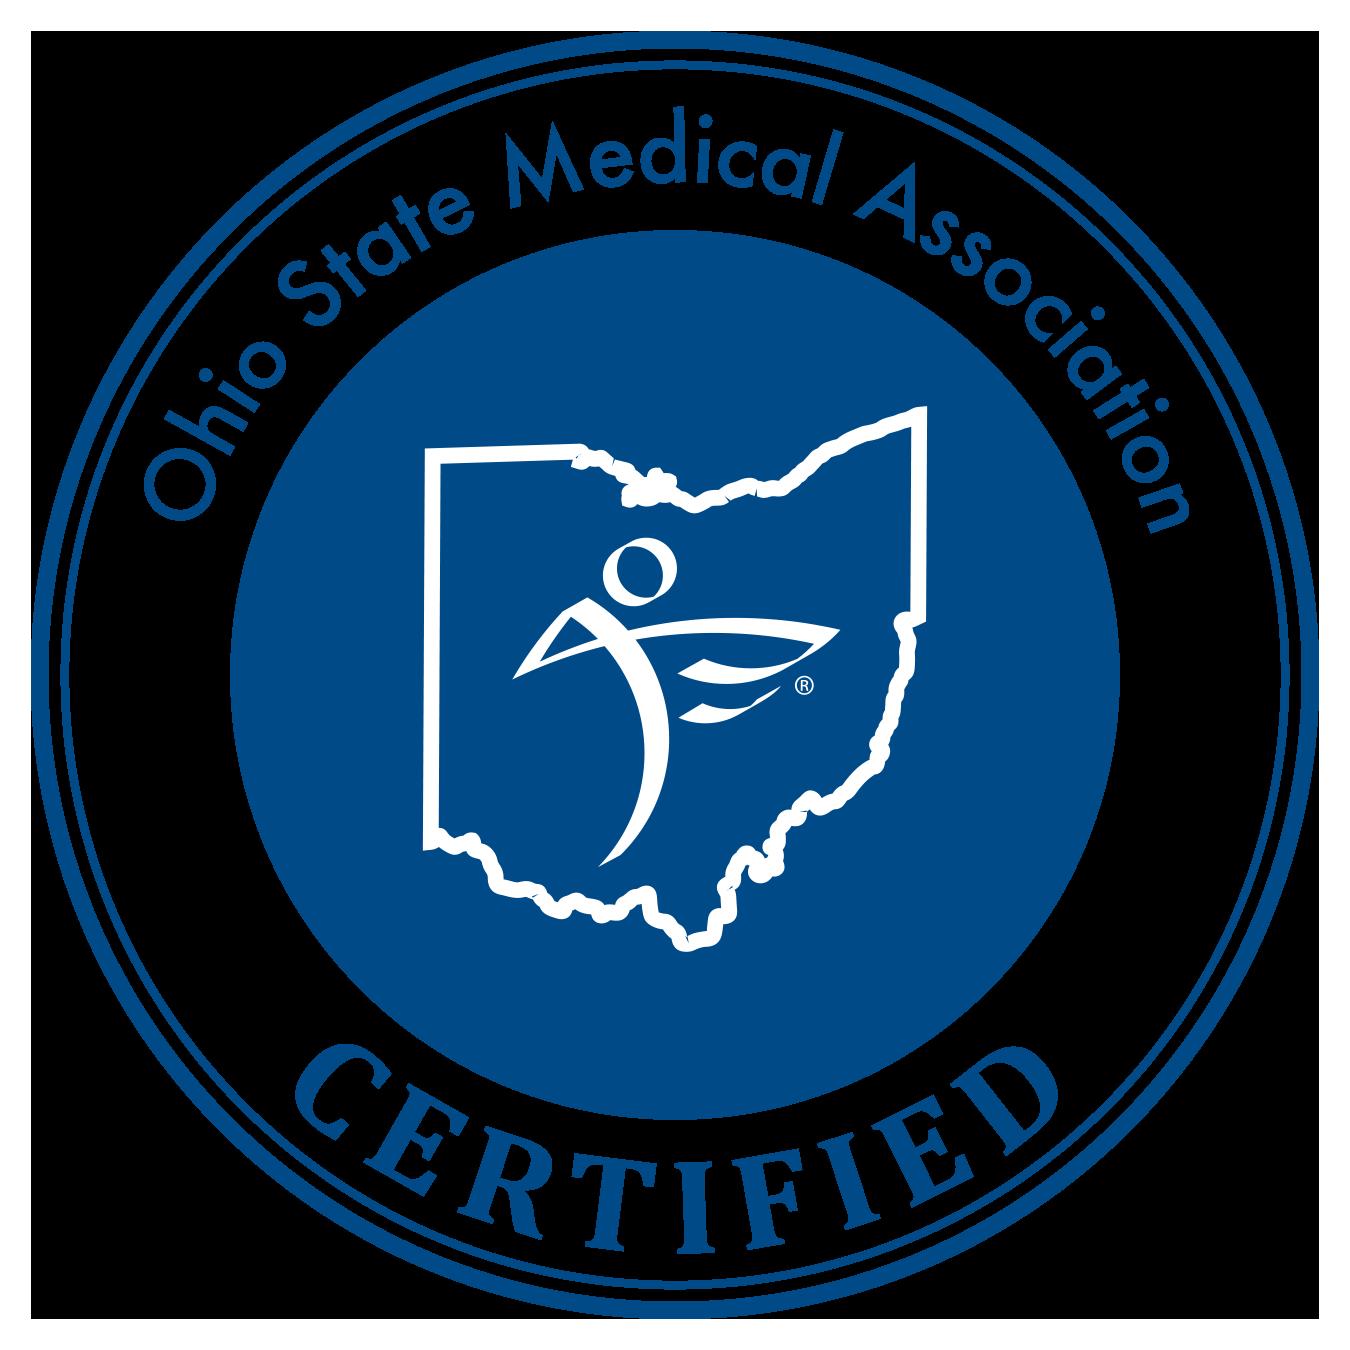 Course provider: MedicalMarijuanaCME.org